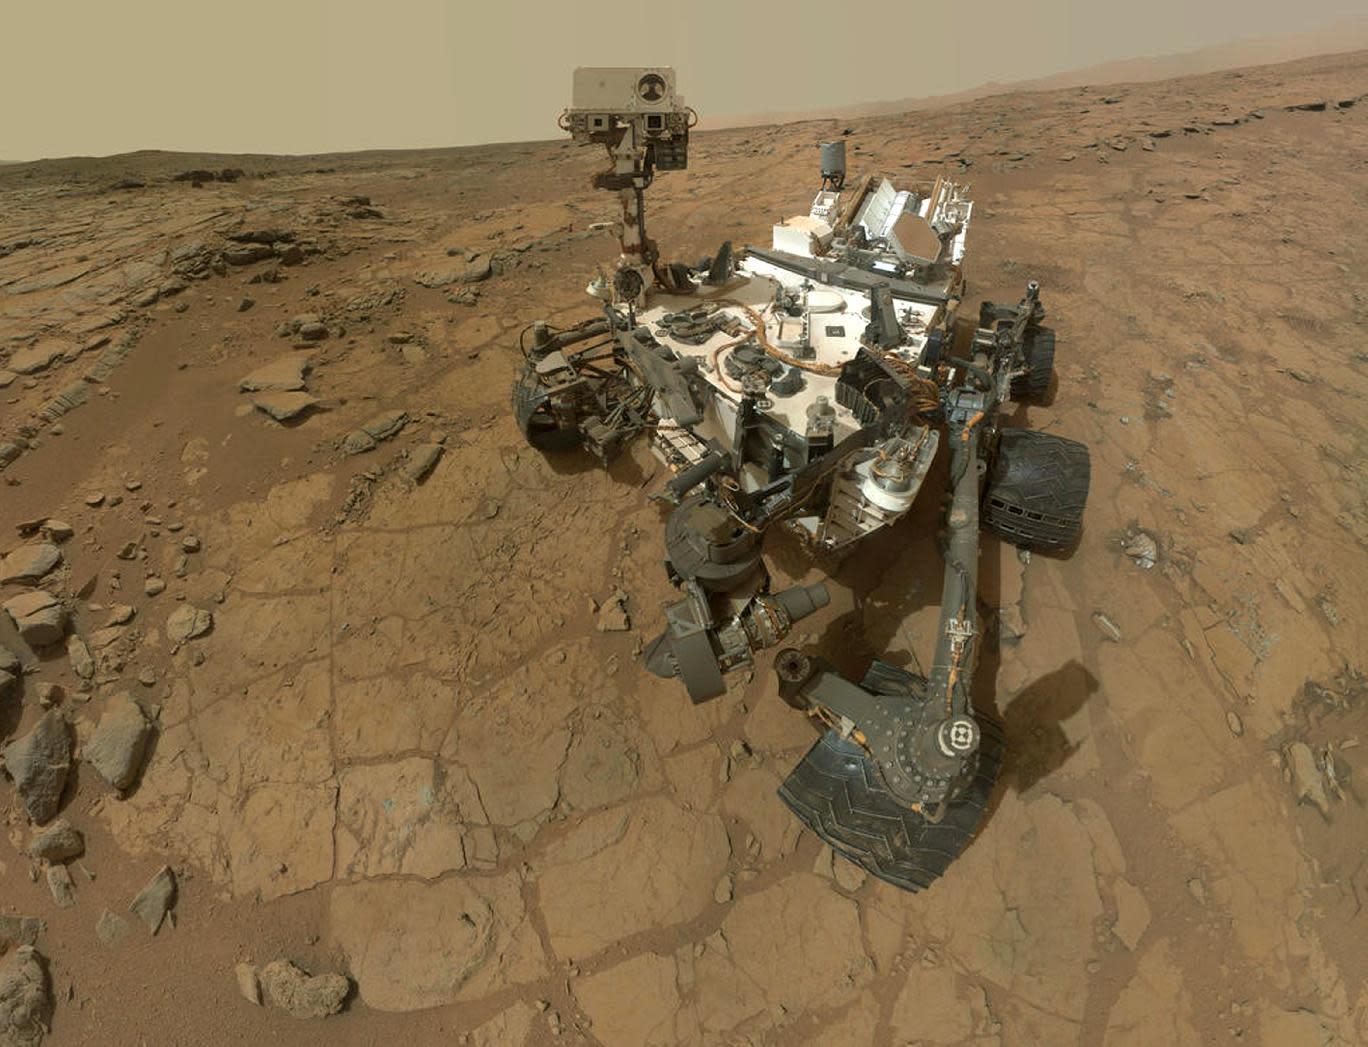 NASA's Mars rover Curiosity on Mars, February 7, 2013